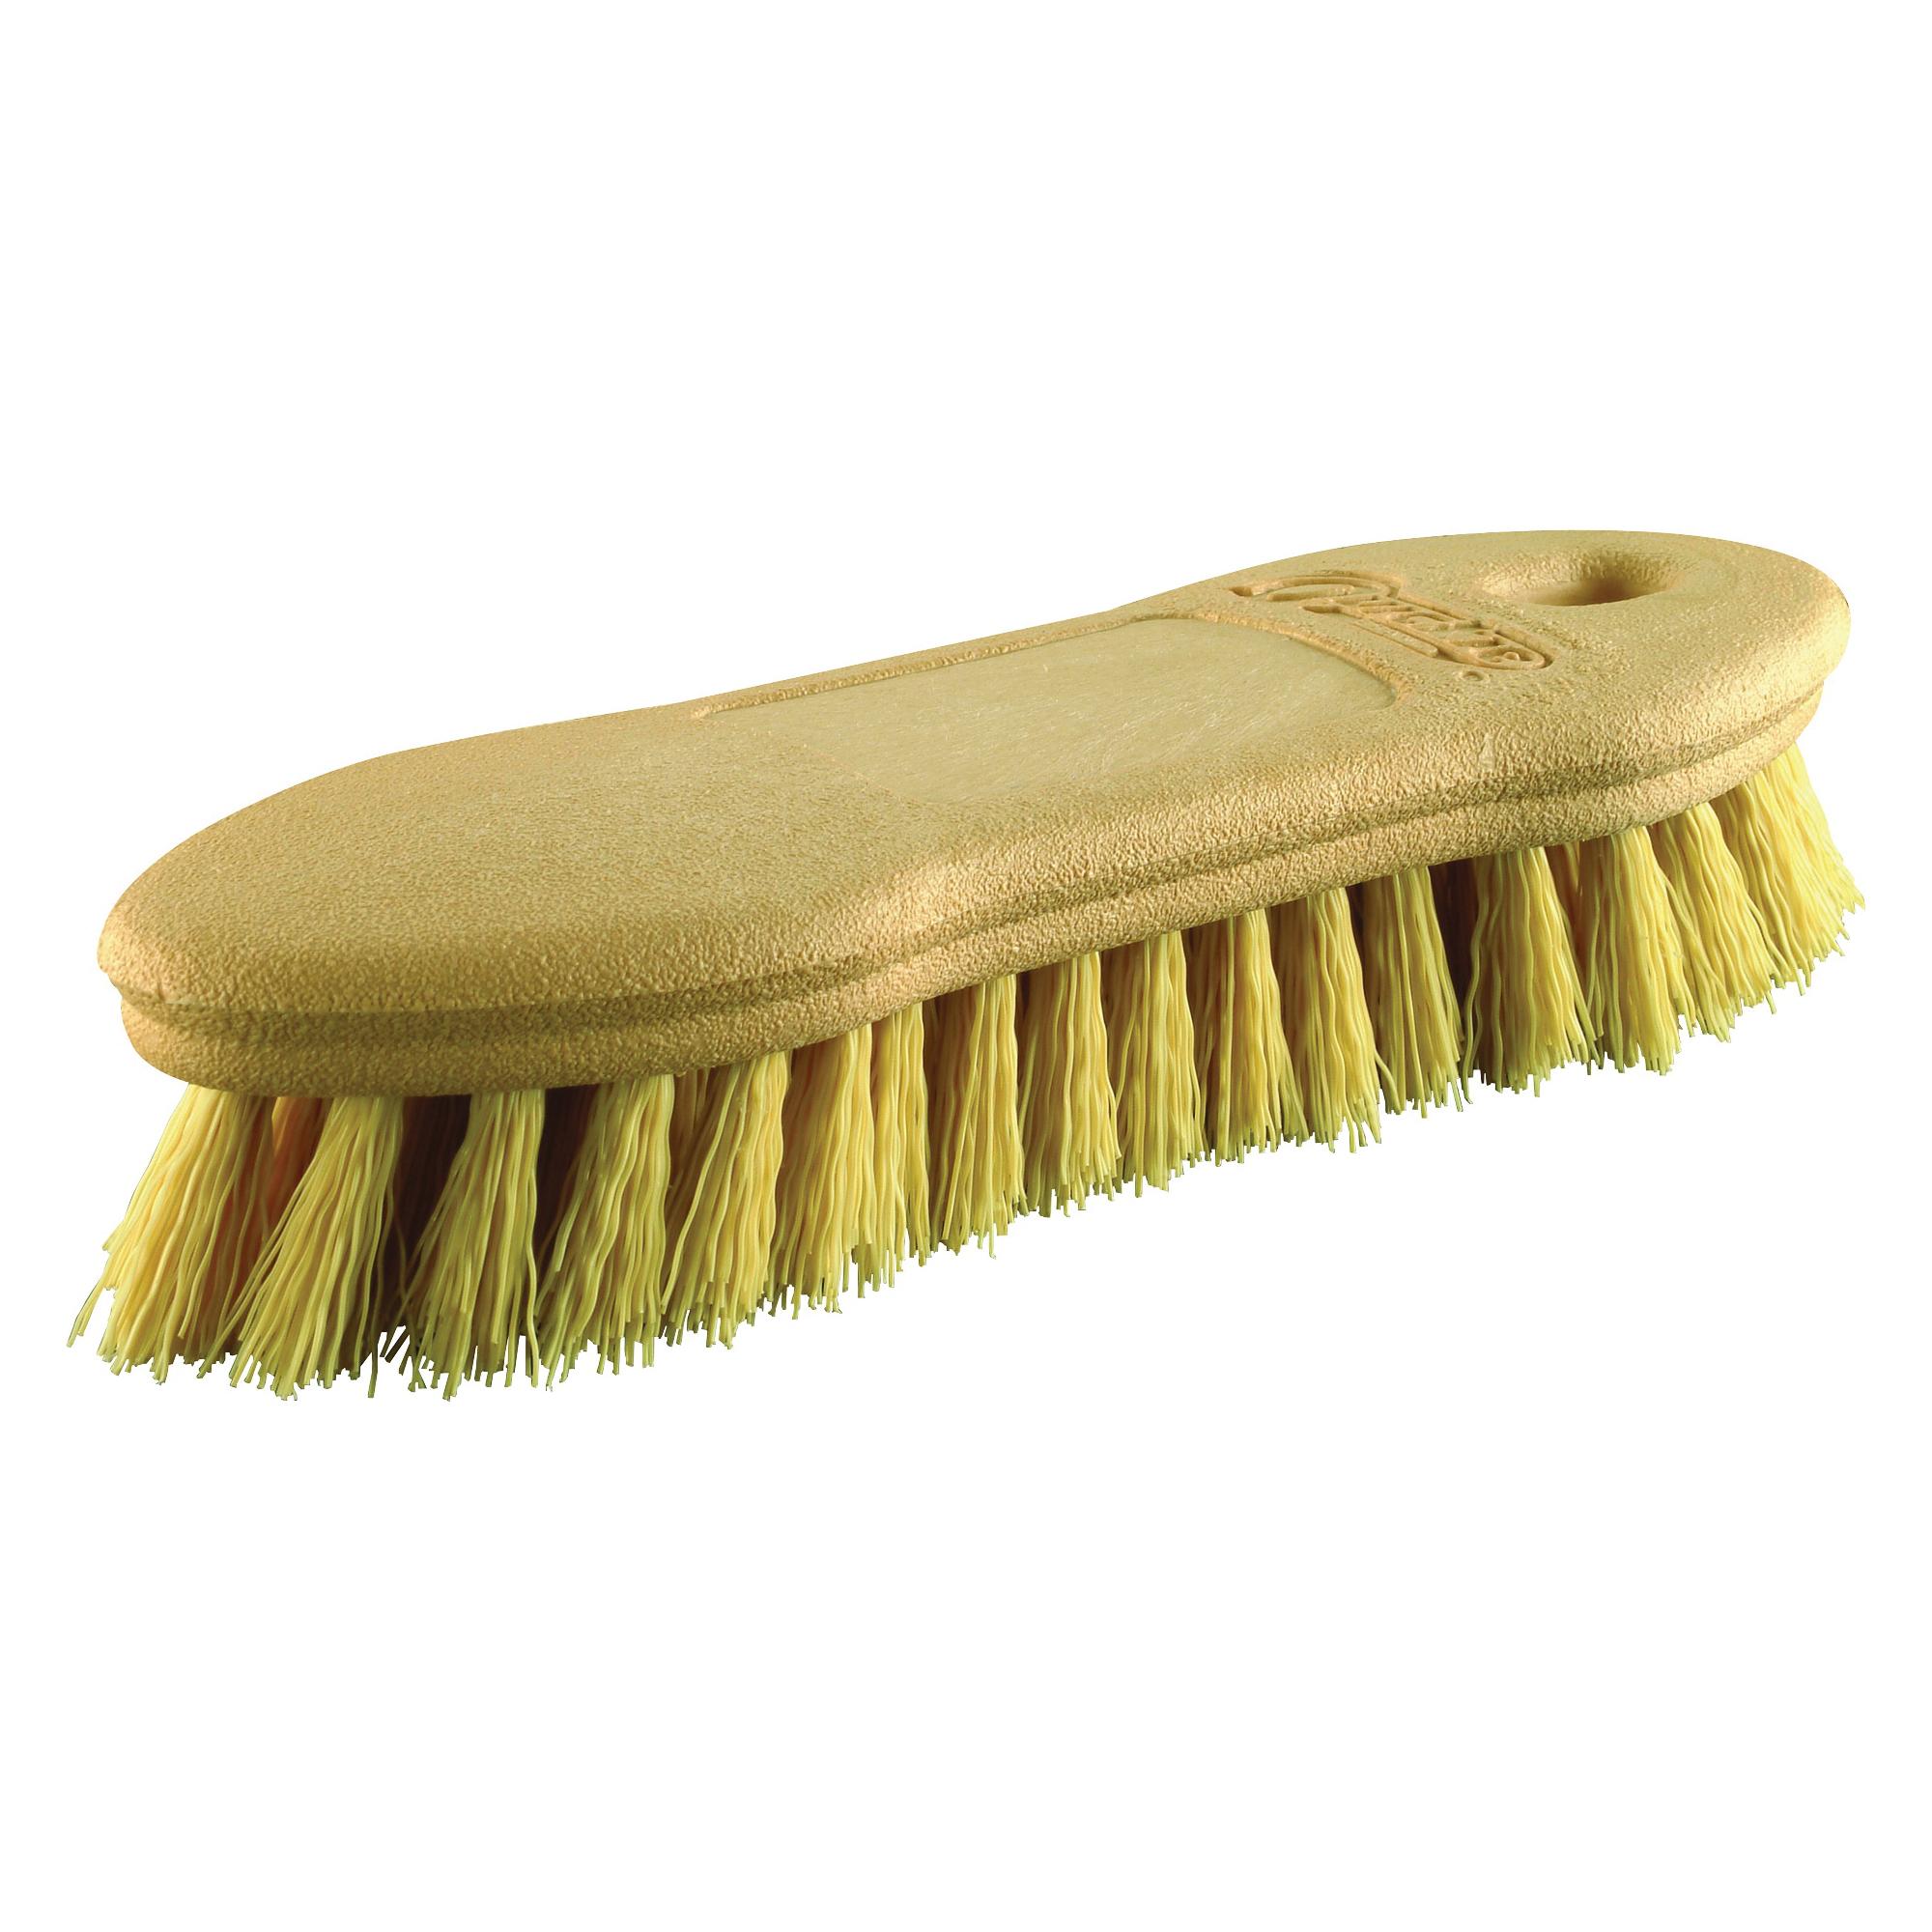 Picture of Quickie 203 Scrubber Brush, 1 in L Trim, Dark Gray Bristle